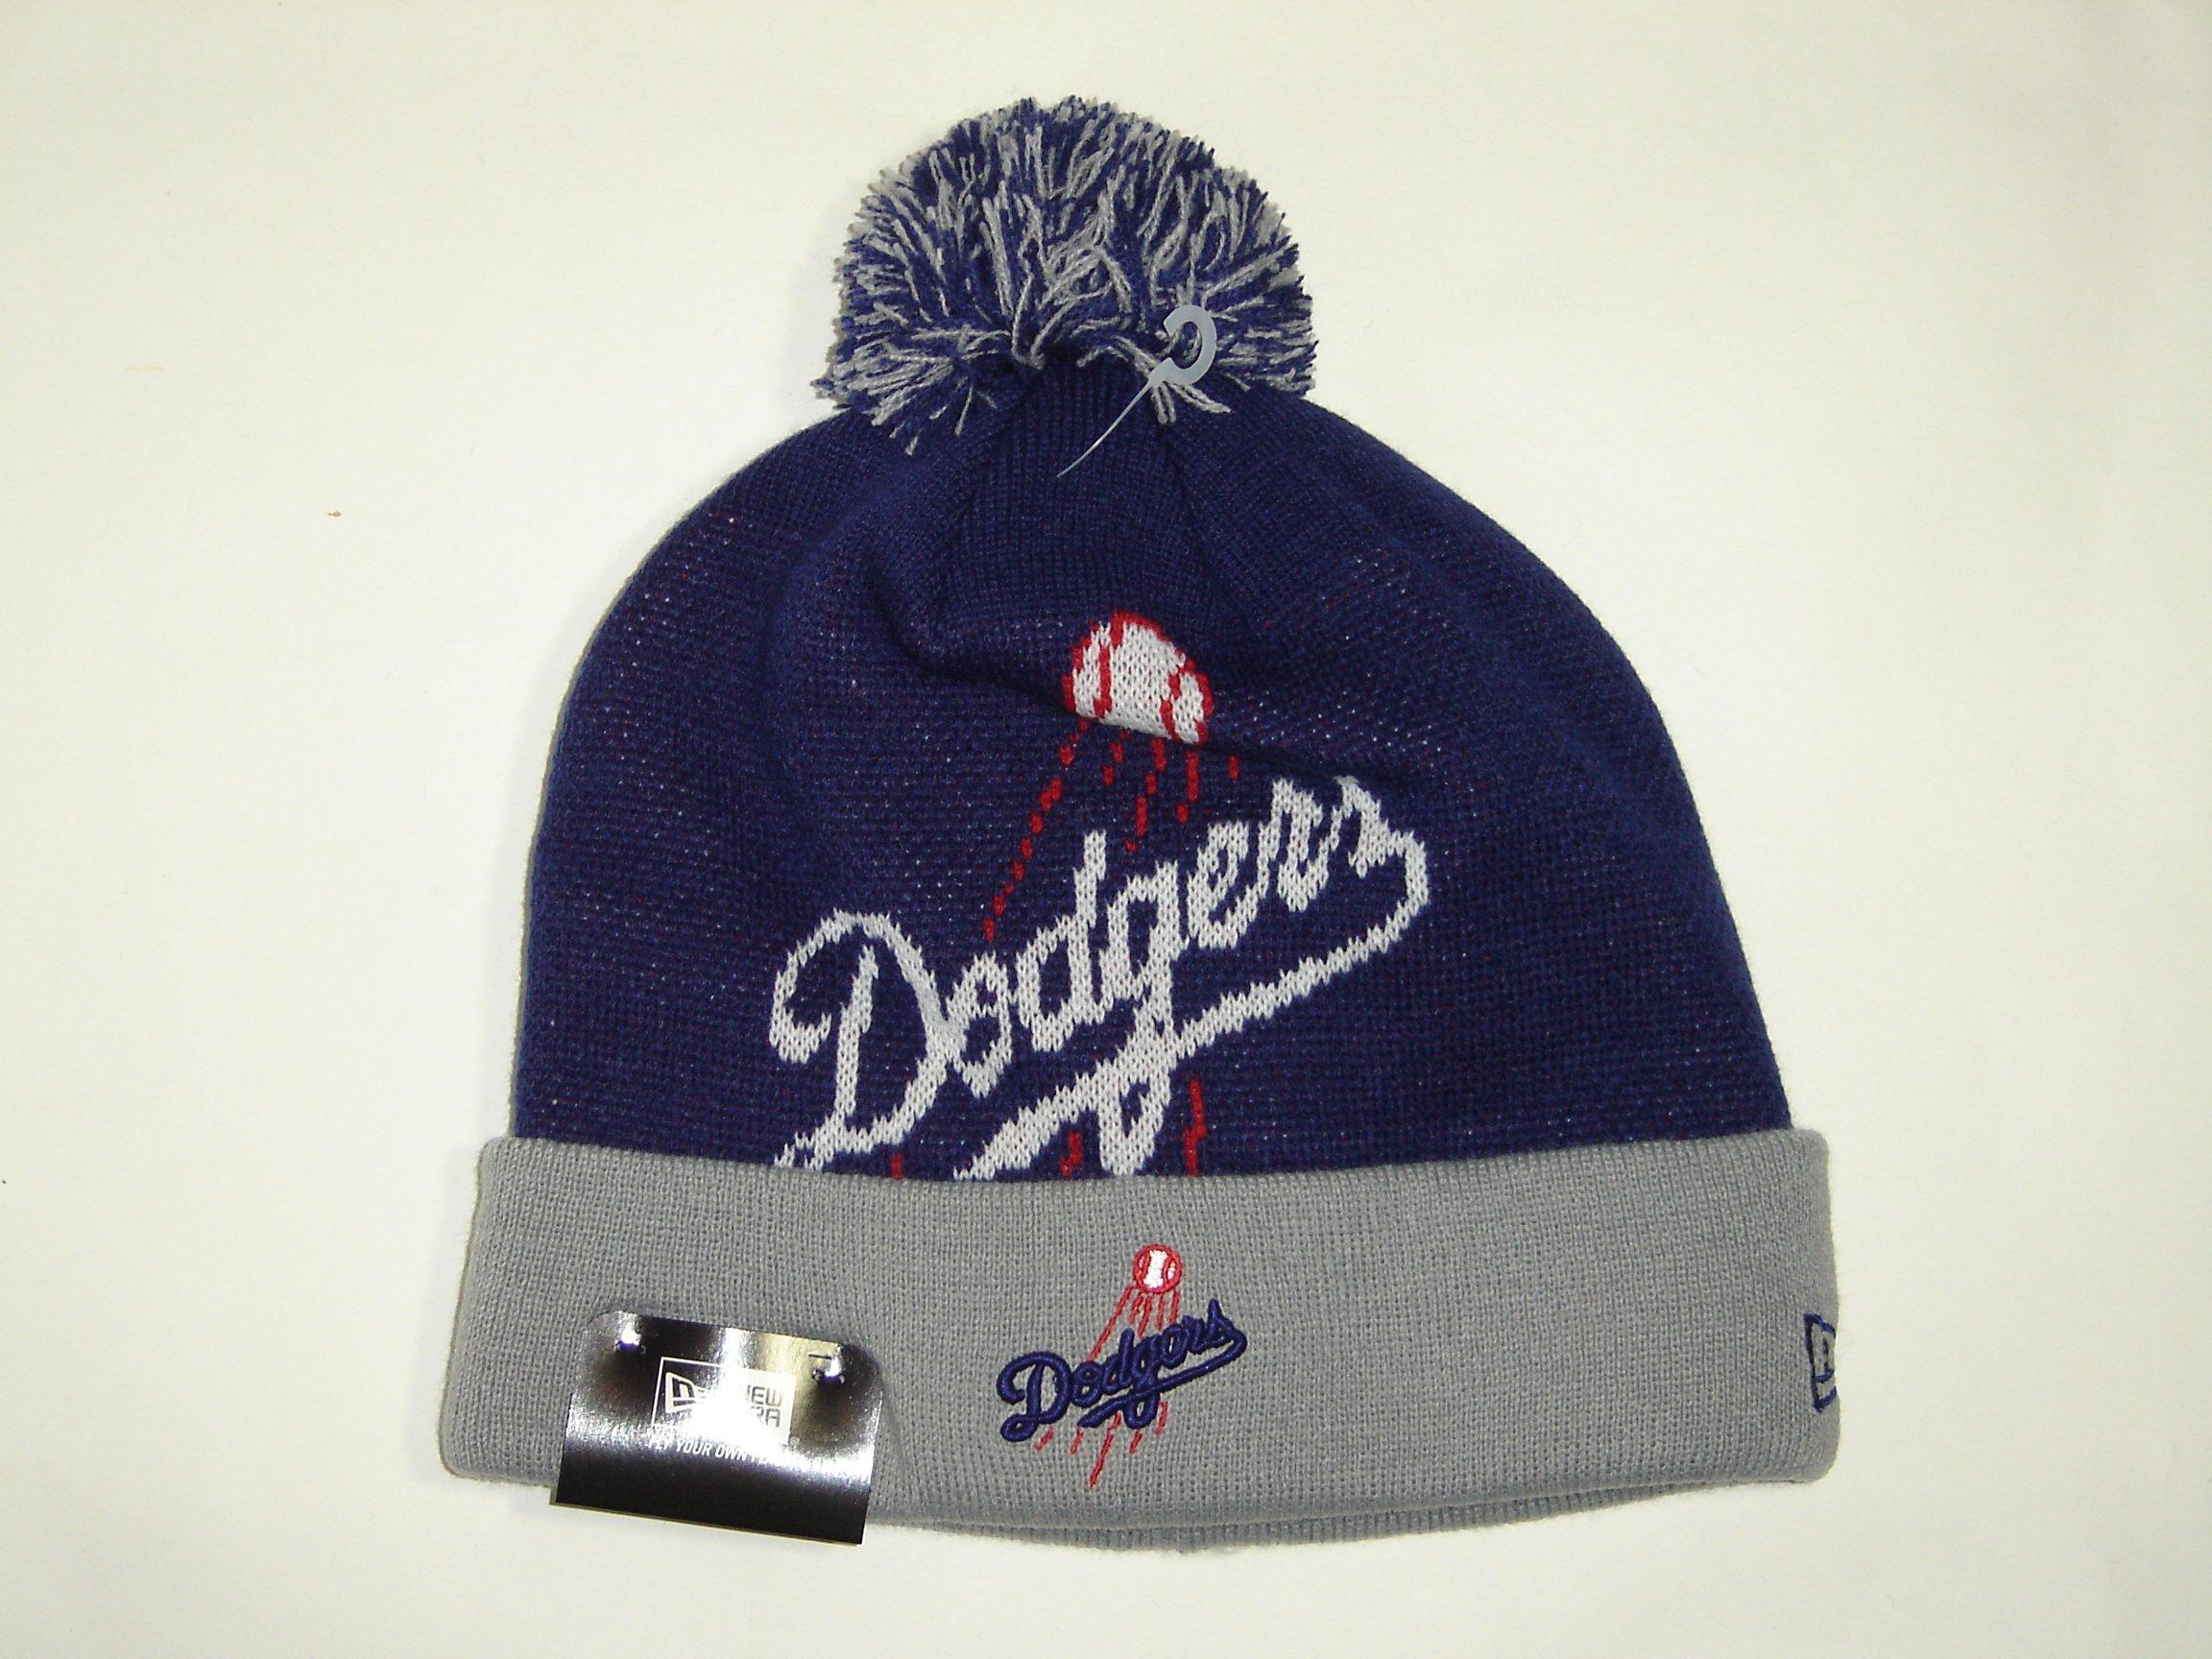 new arrivals 8d3ad 35f83 Get Quotations · New Era MLB Los Angeles Dodgers 2 Tone Logo Cuffed Knit  Beanie Cap with Pom NewEra